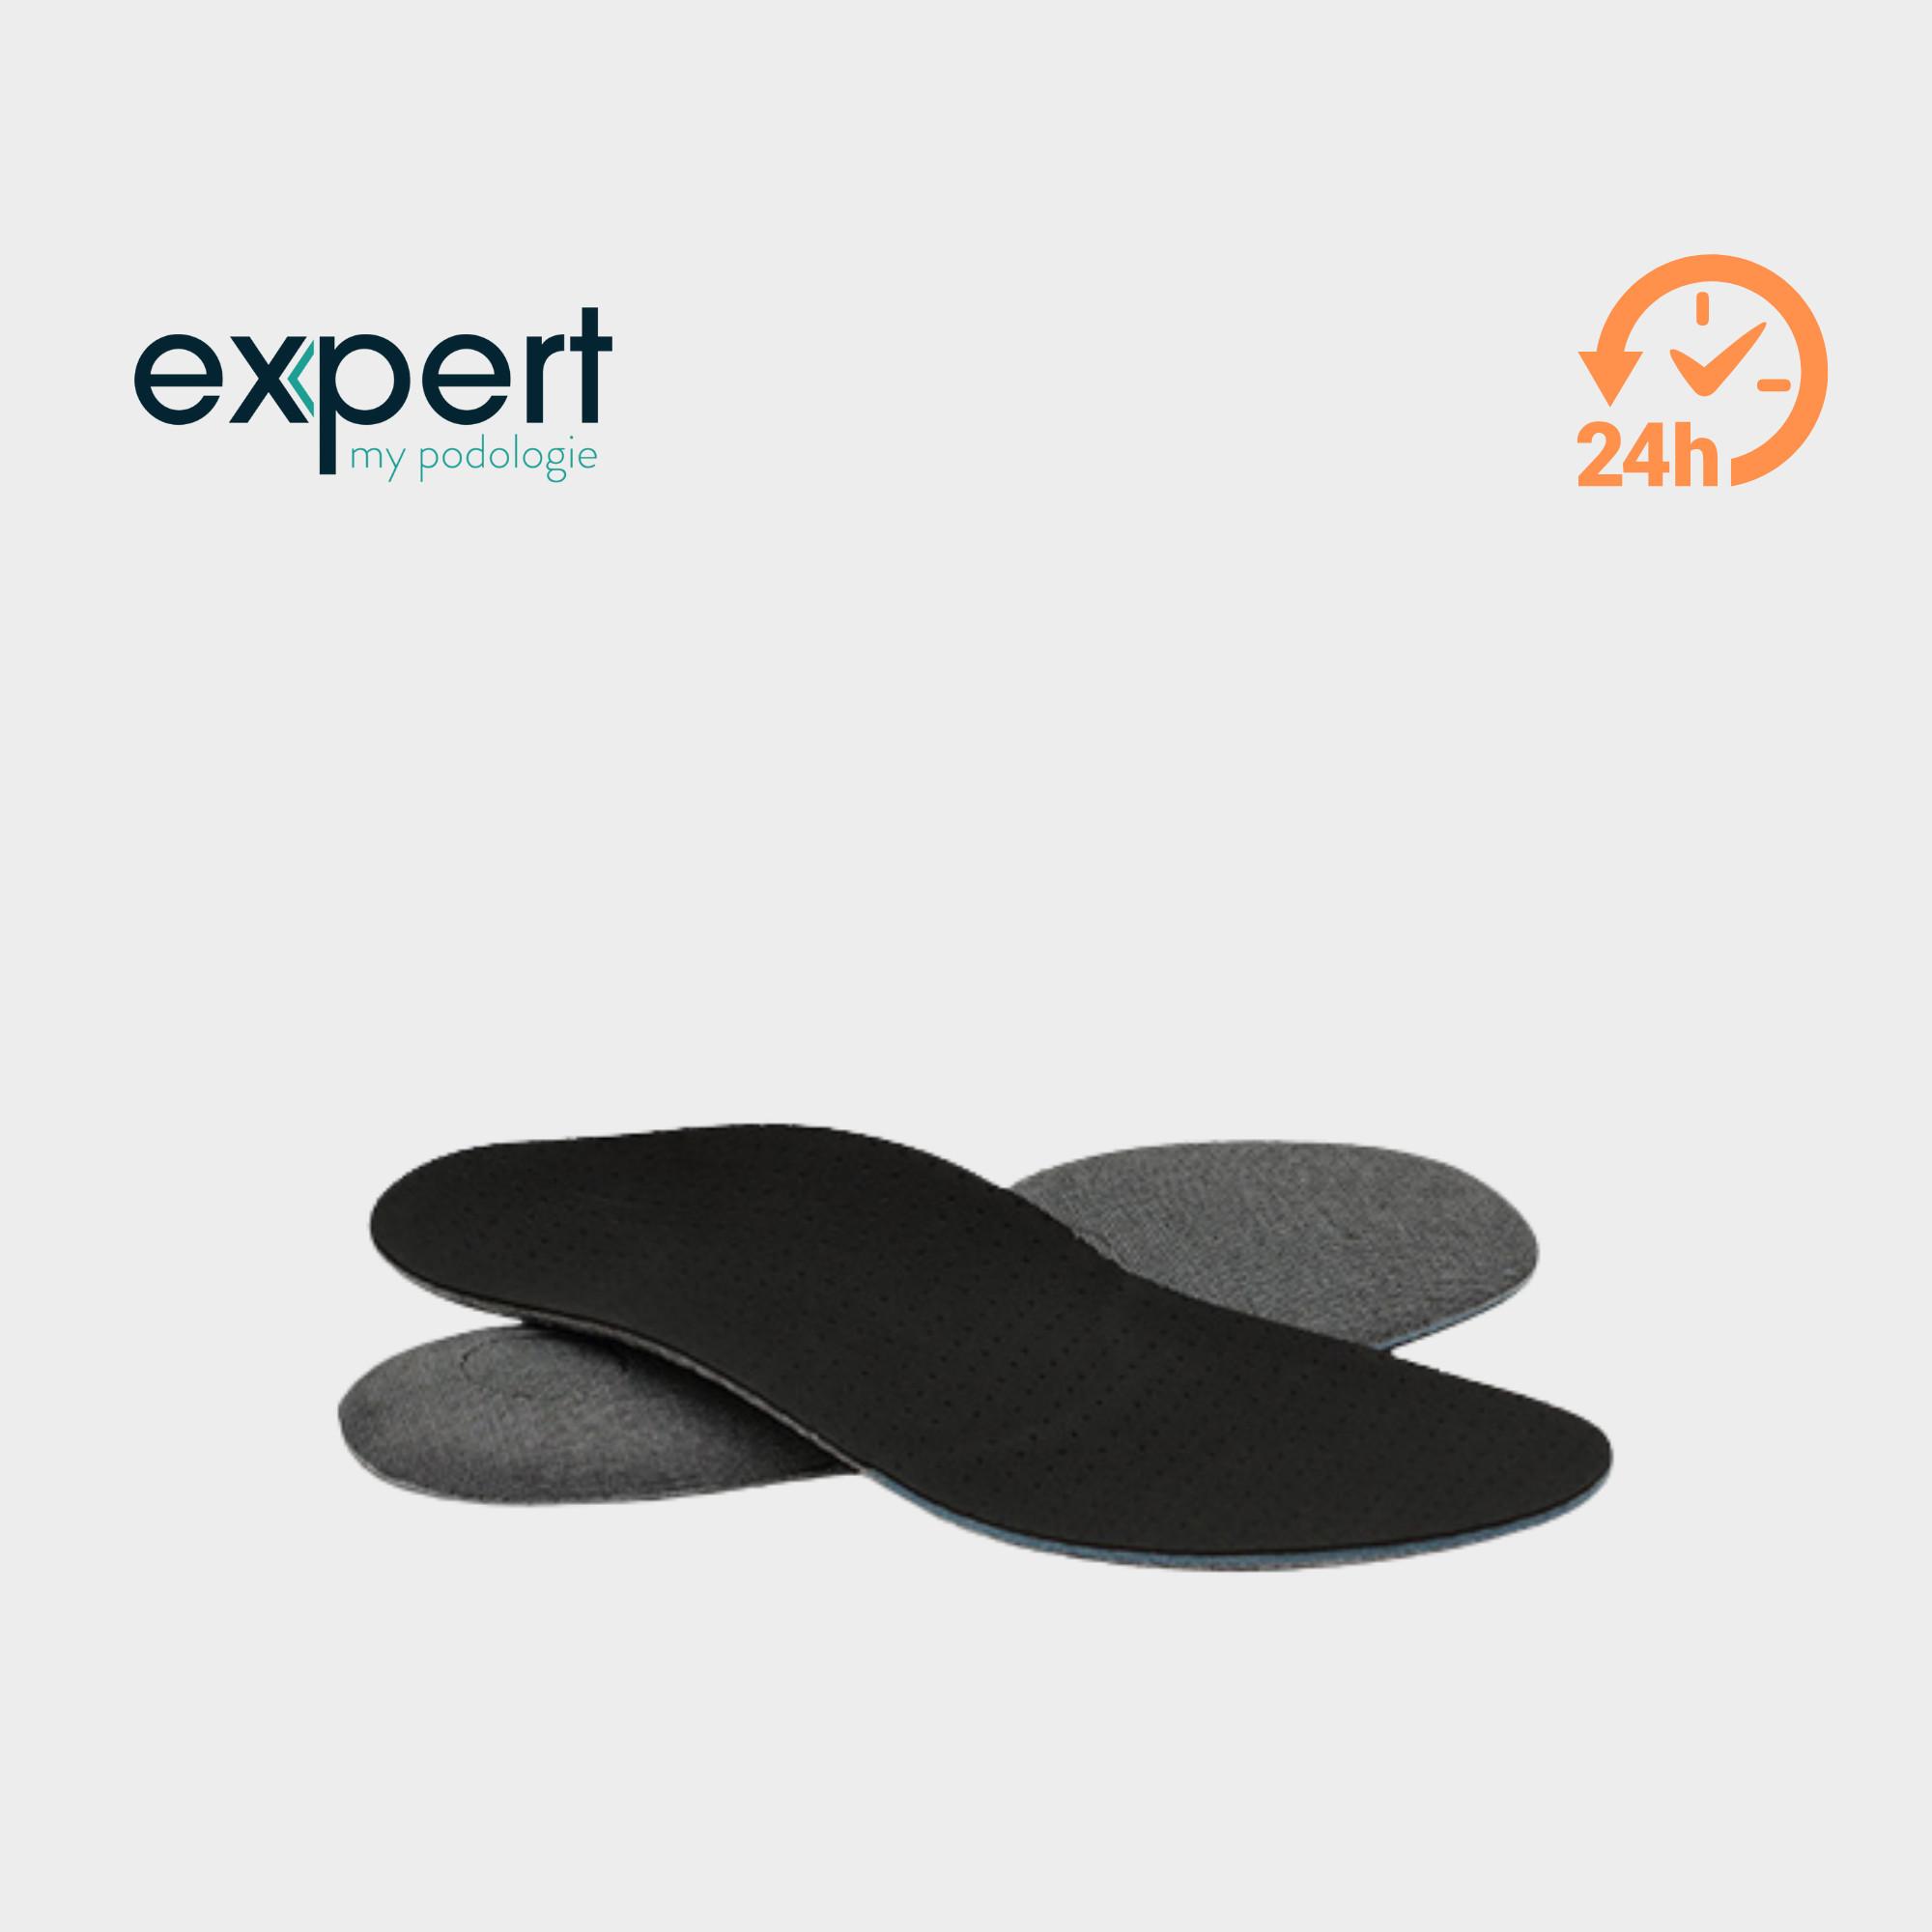 Métatarsalgie Femme Plus - Express 24h - Expert by My Podologie